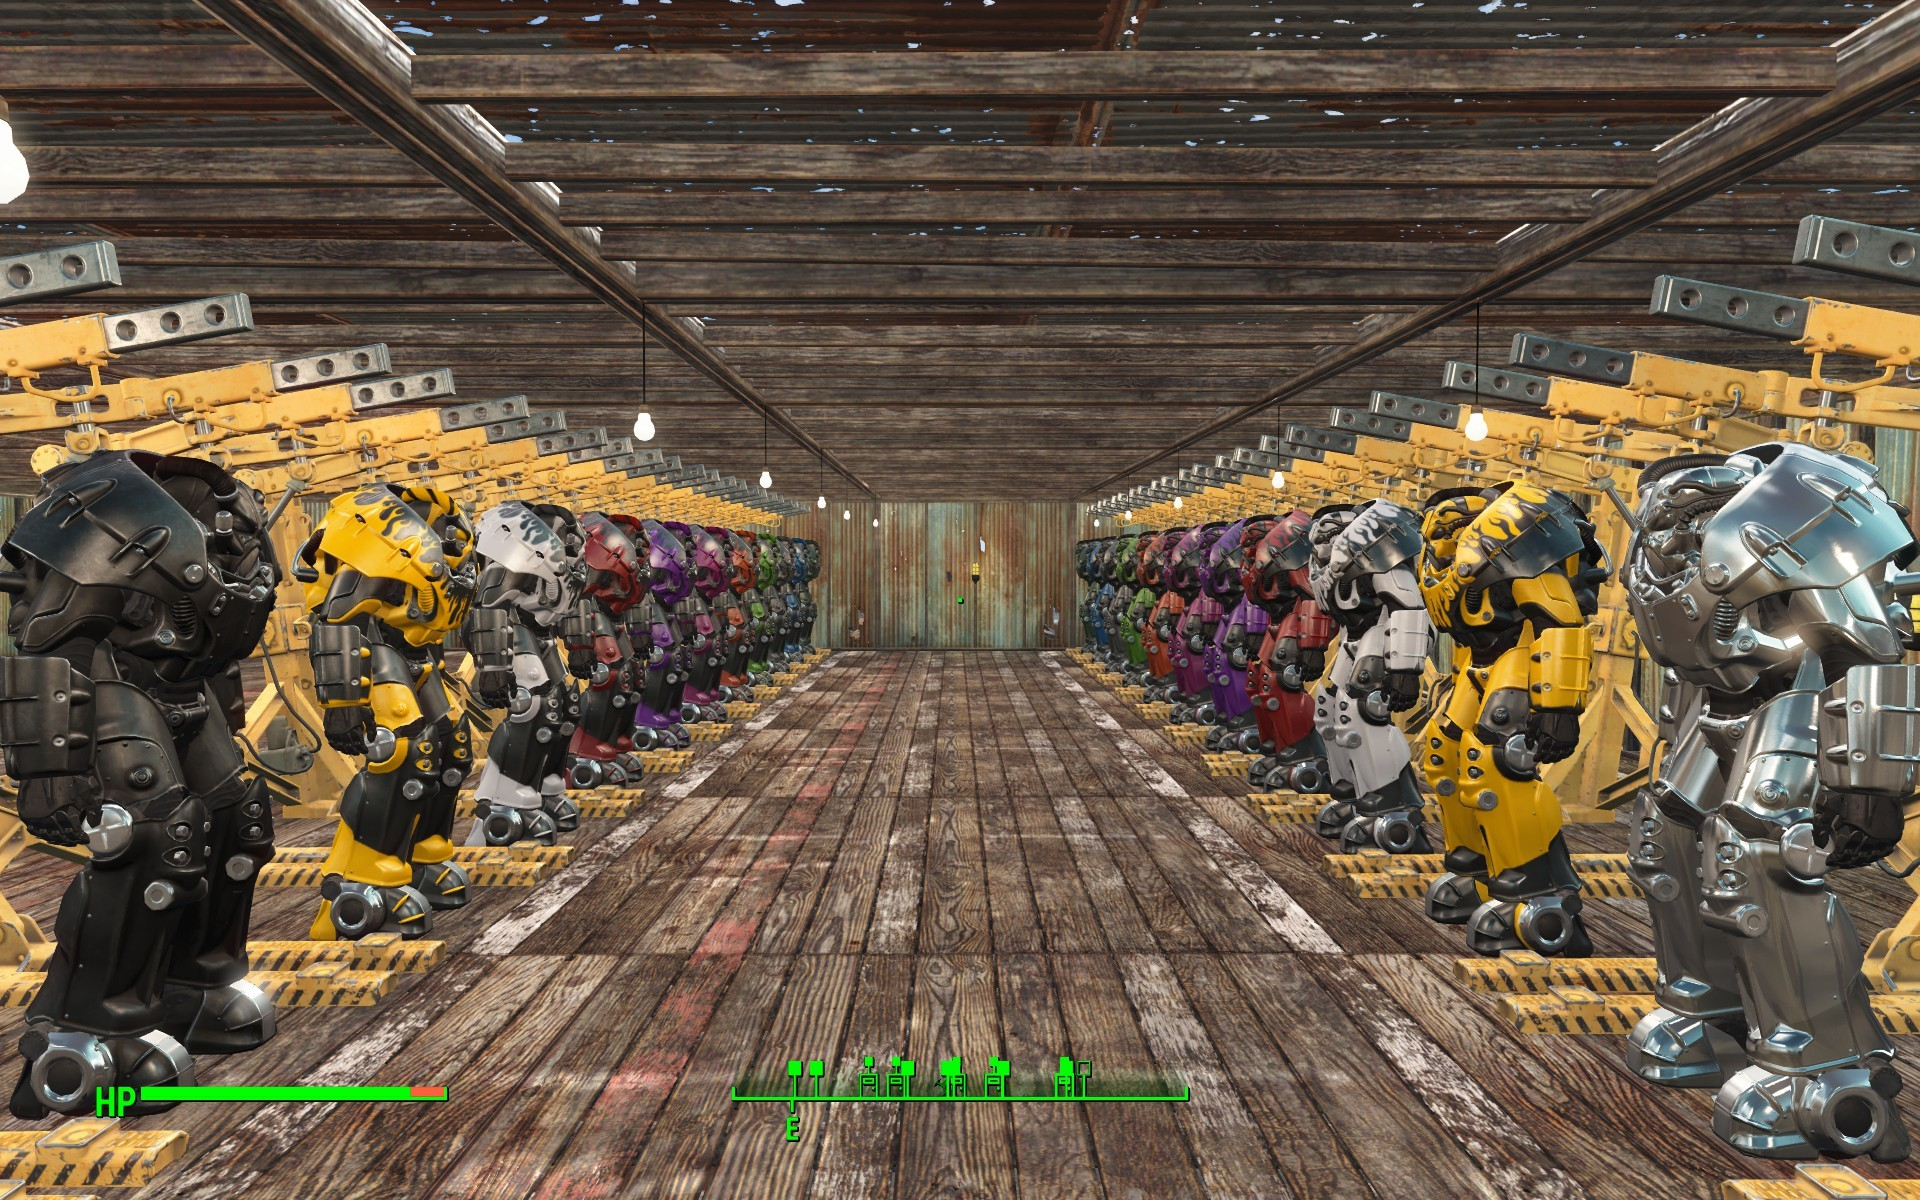 fallout 4 power armor garage – Google Search